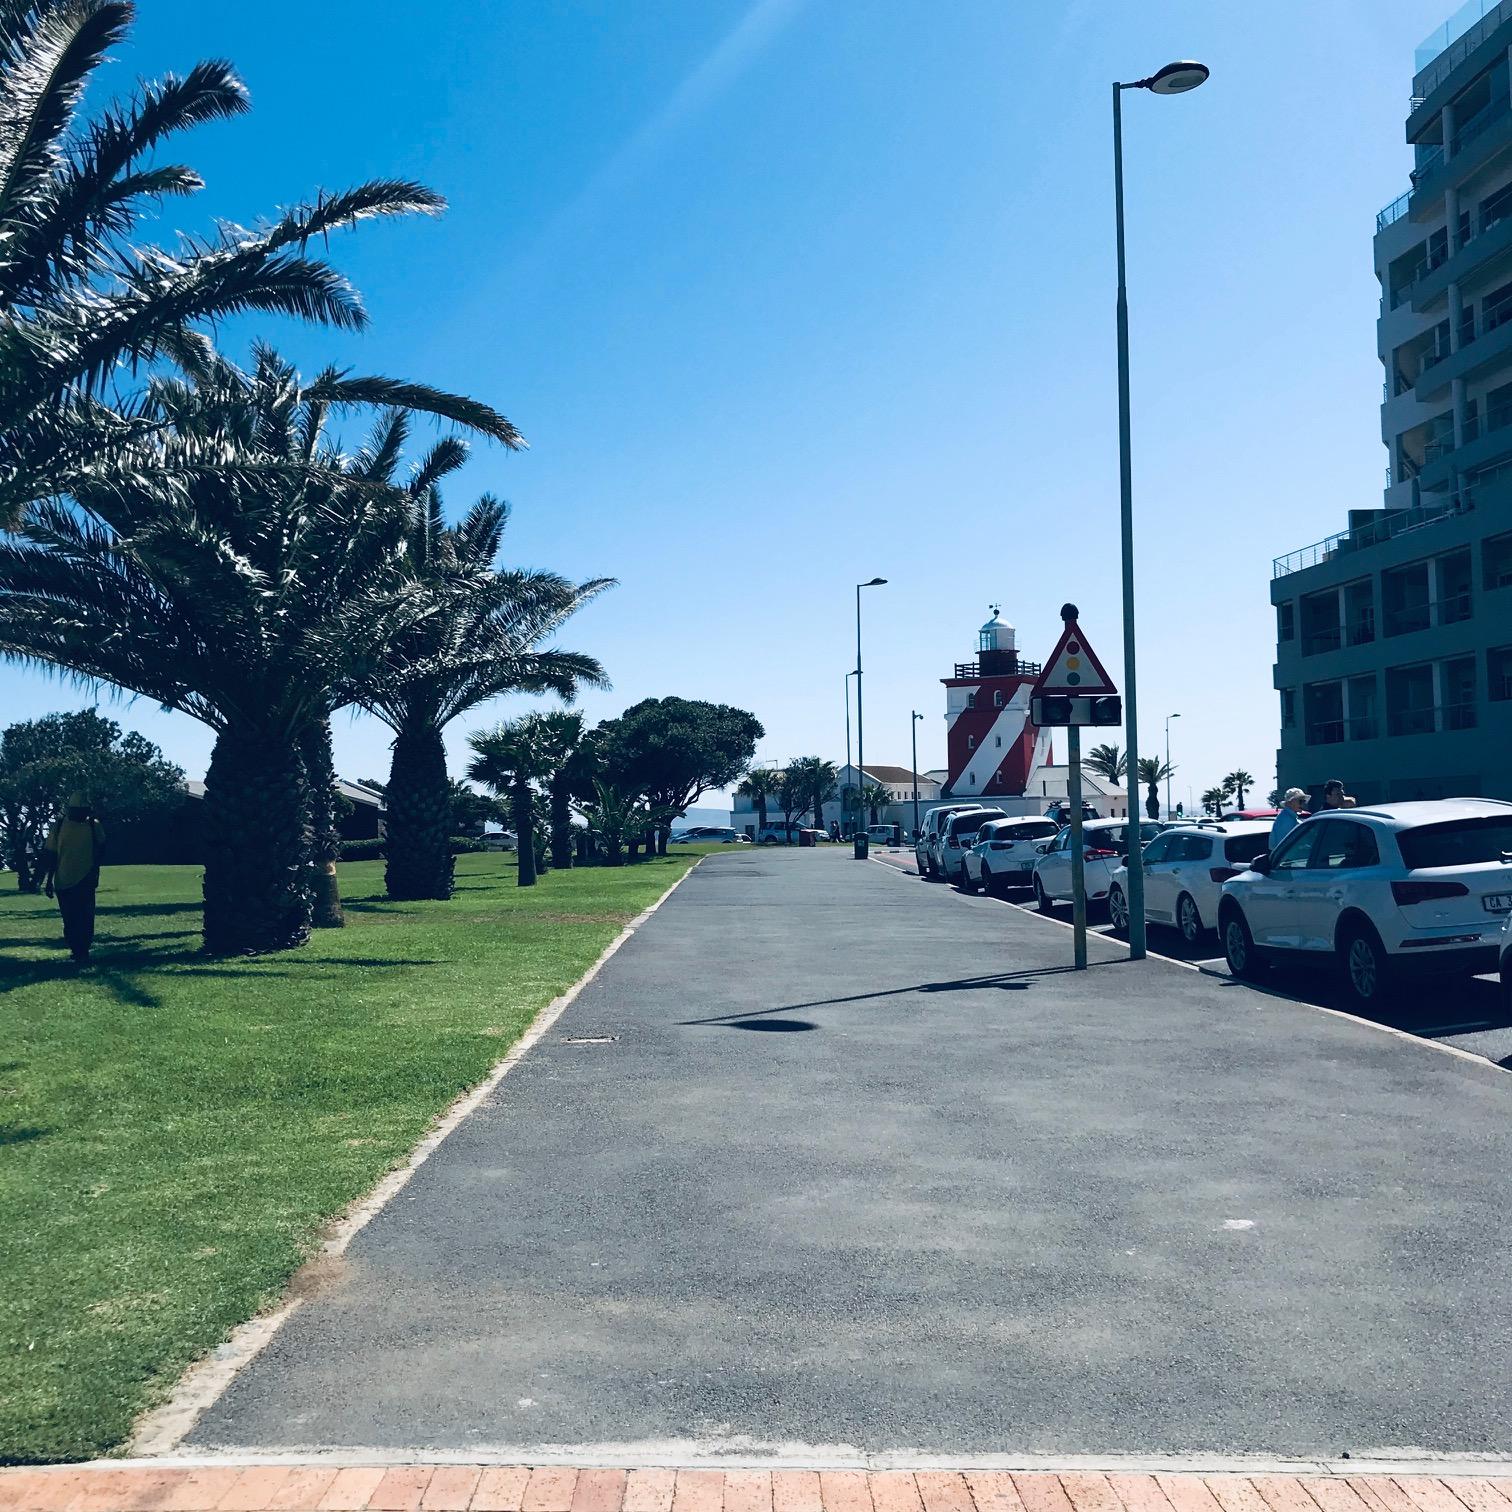 Mouille Point, Cape Town